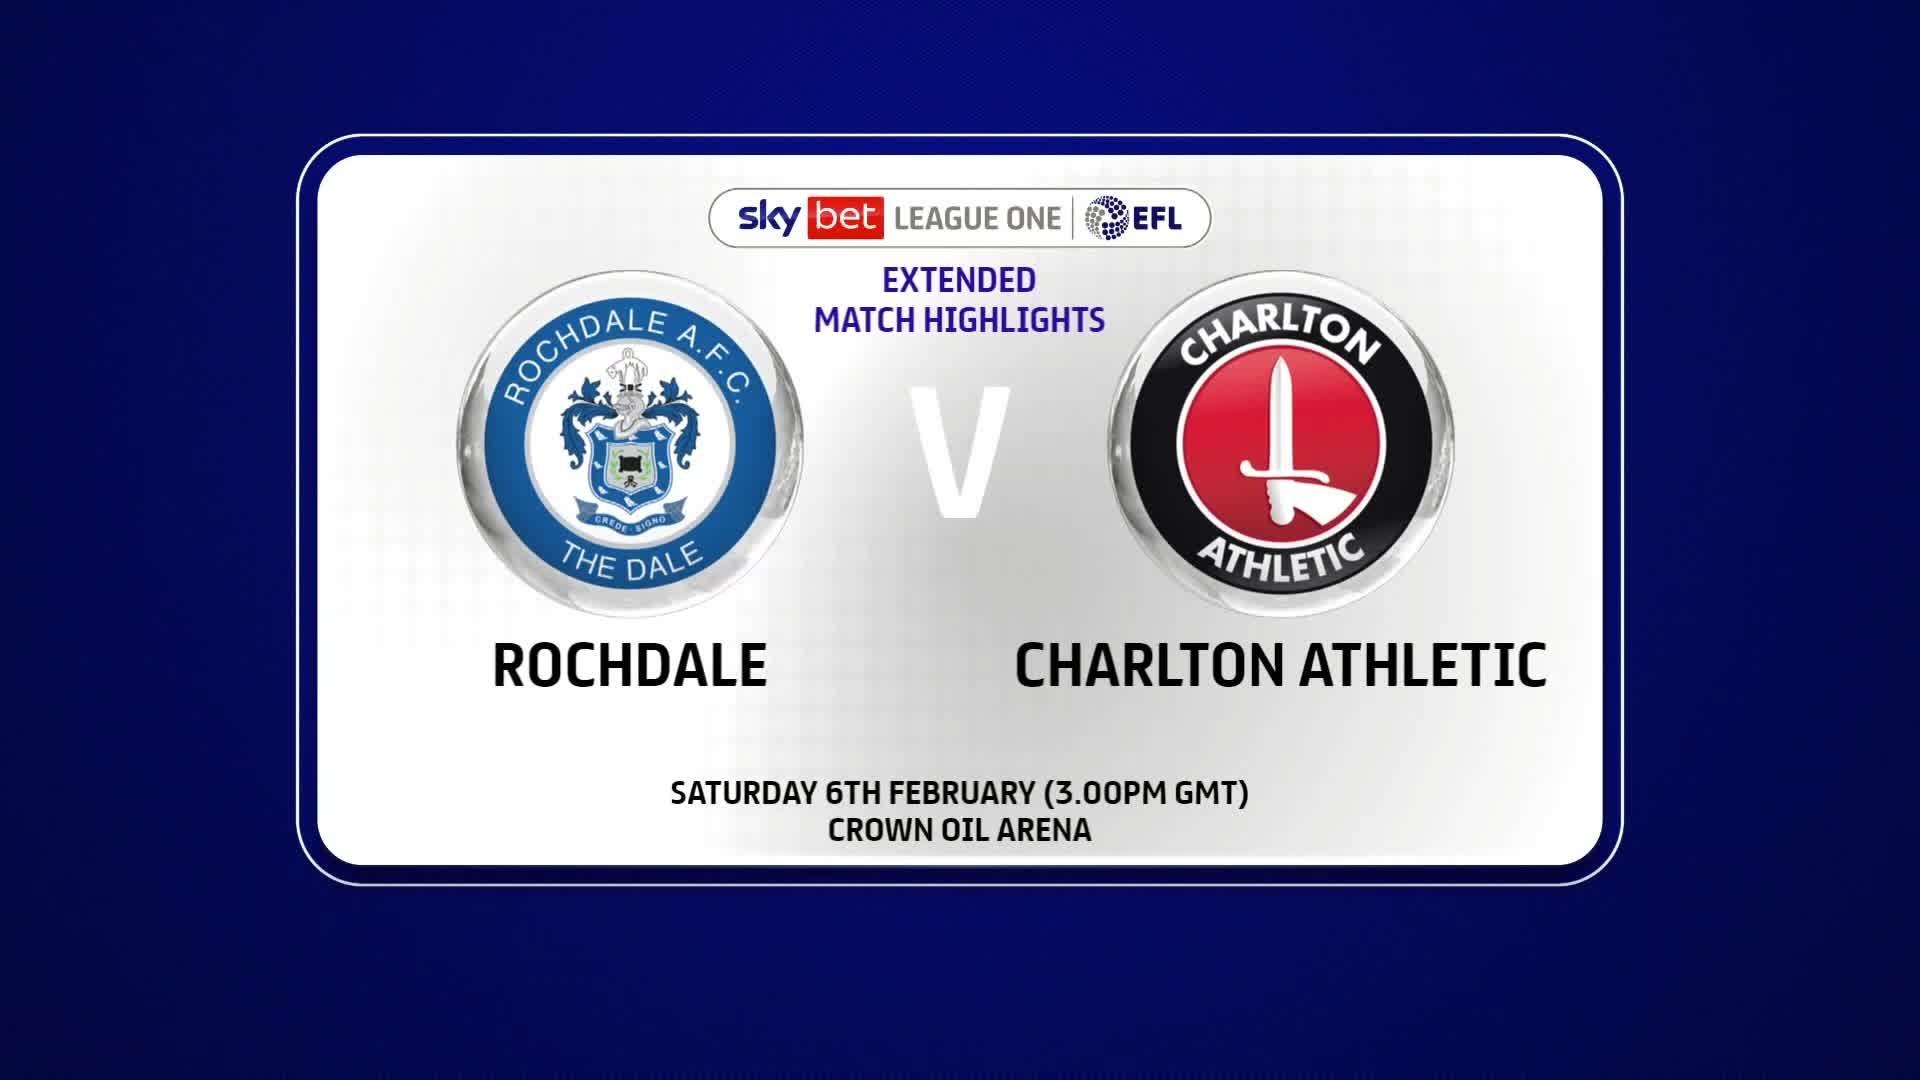 EXTENDED | Rochdale 0 Charlton 2 (February 2021)